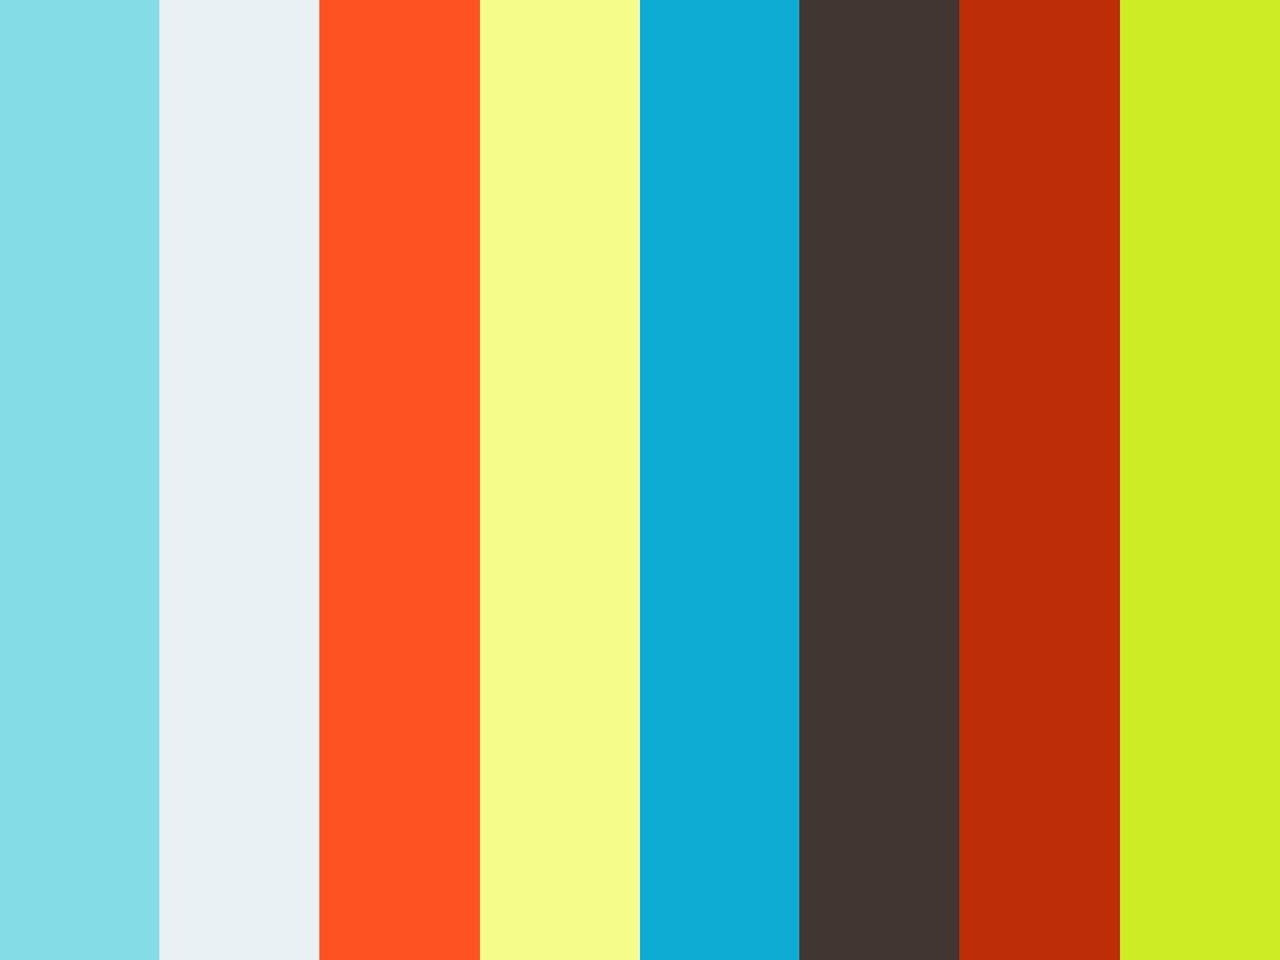 Презентация. Девчачий БОМЖ вело-трип к Стене Троллей. Норвегия лето 2015